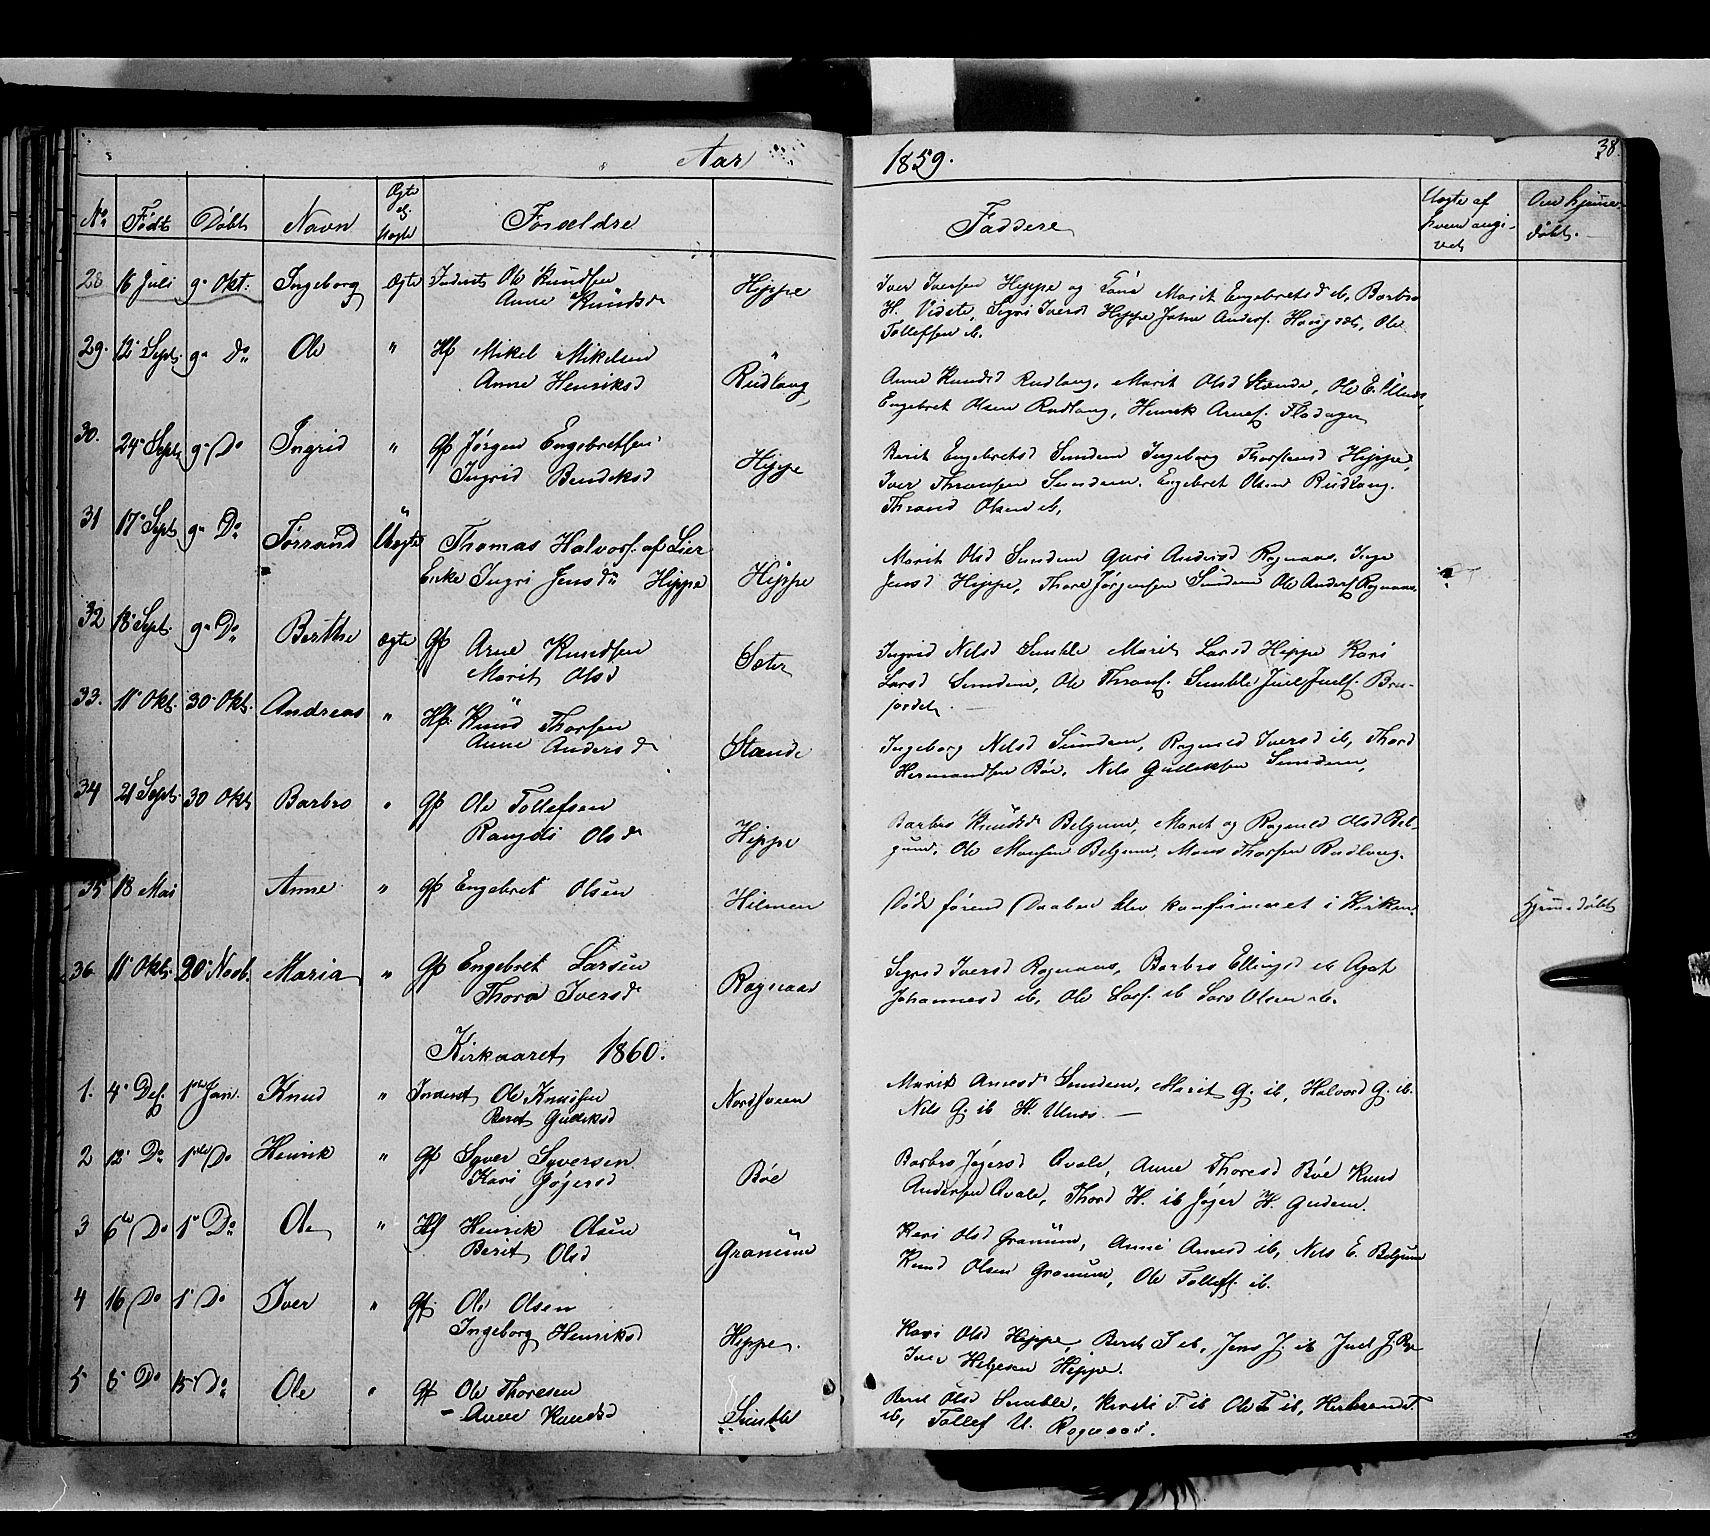 SAH, Nord-Aurdal prestekontor, Ministerialbok nr. 6, 1842-1863, s. 38